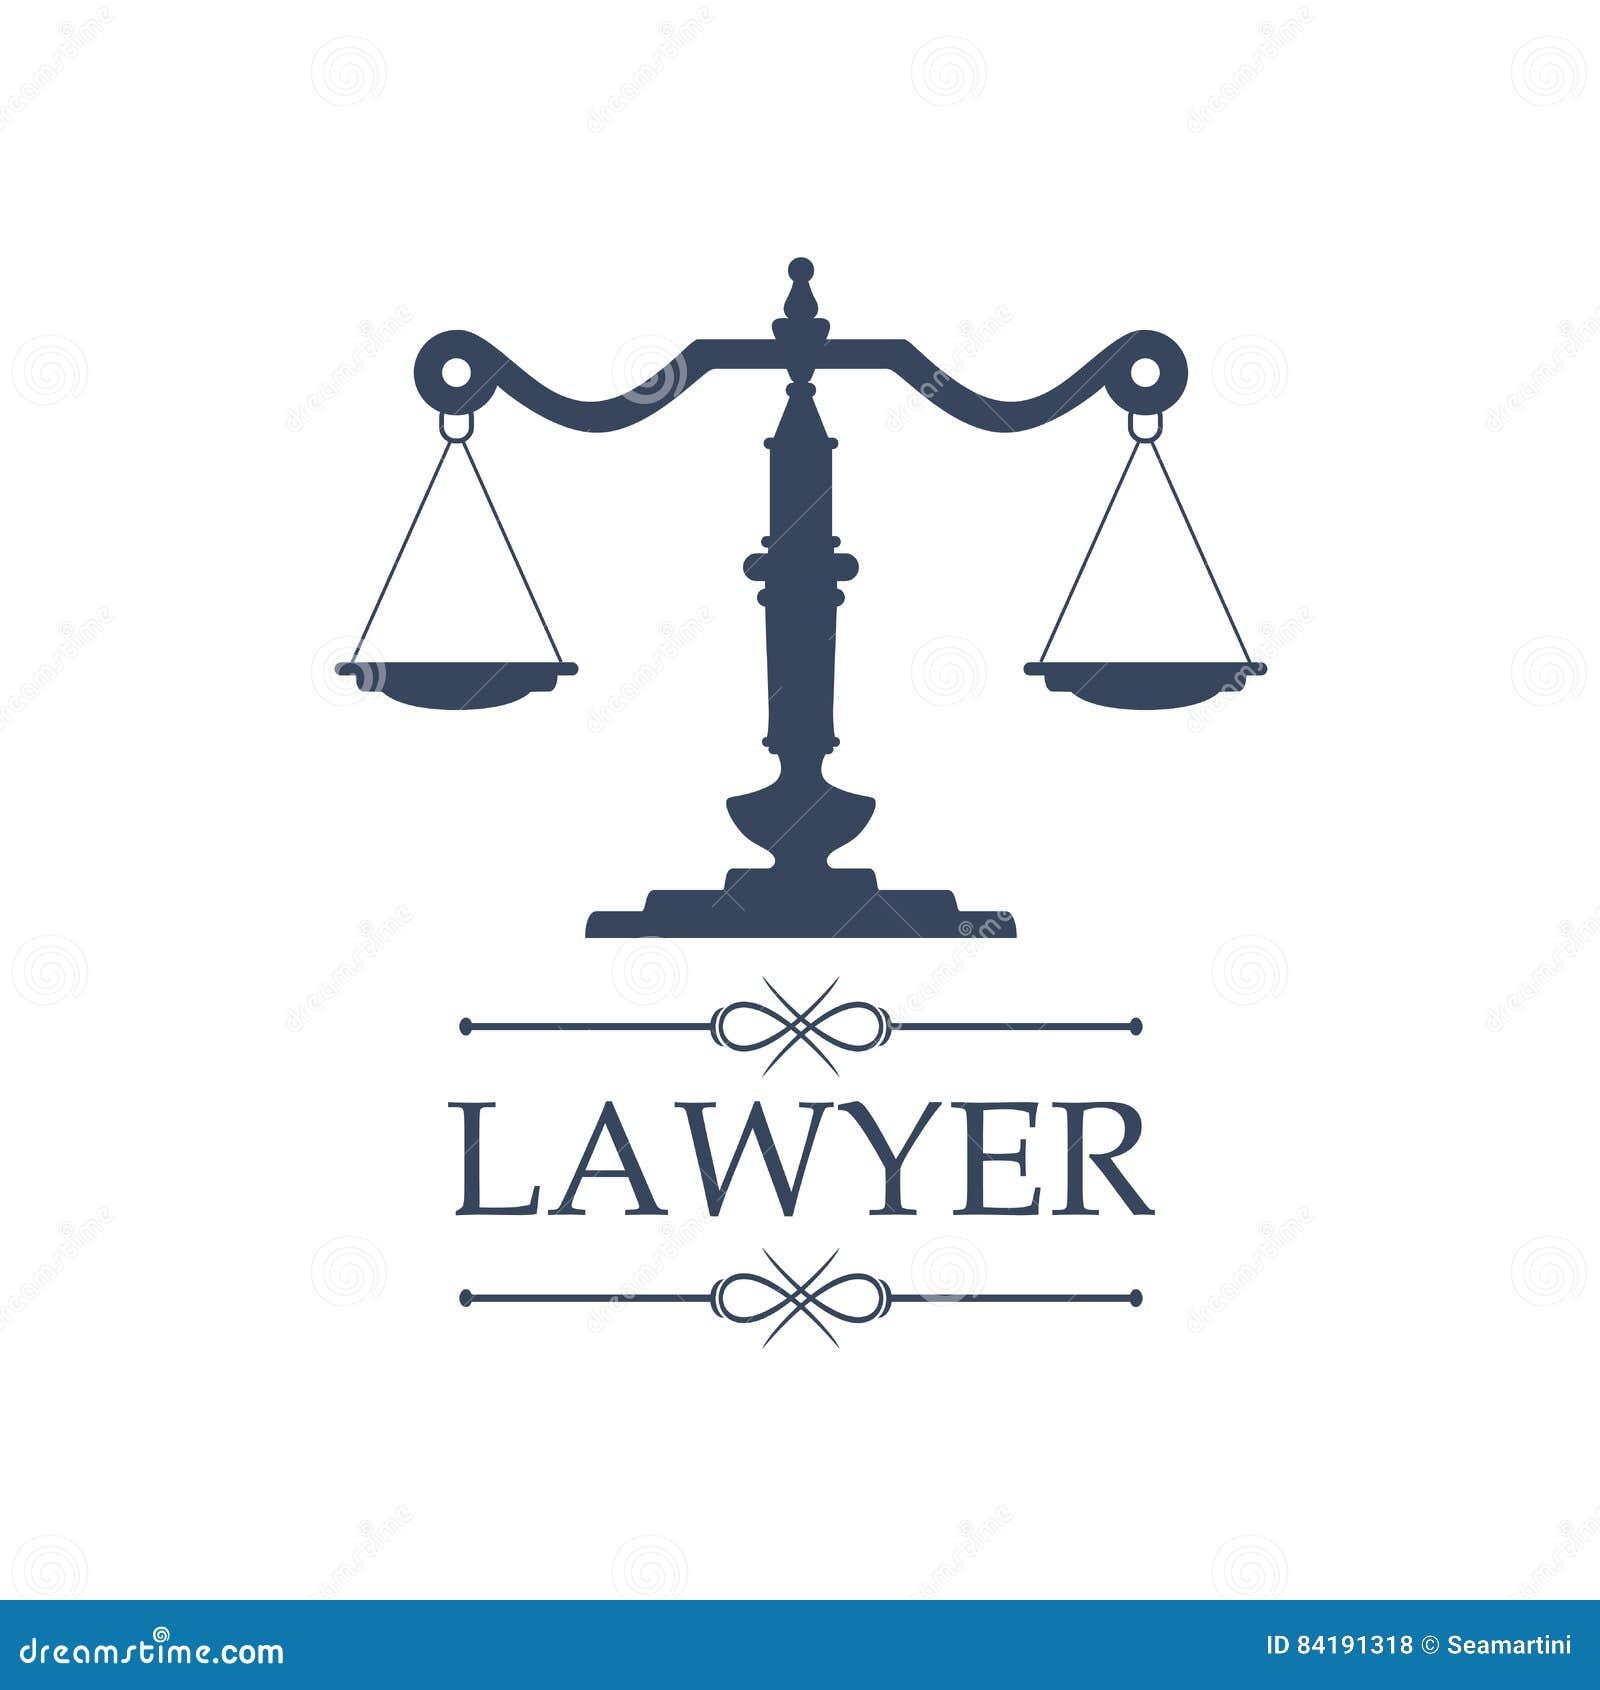 lawyer symbol clipart wwwpixsharkcom images